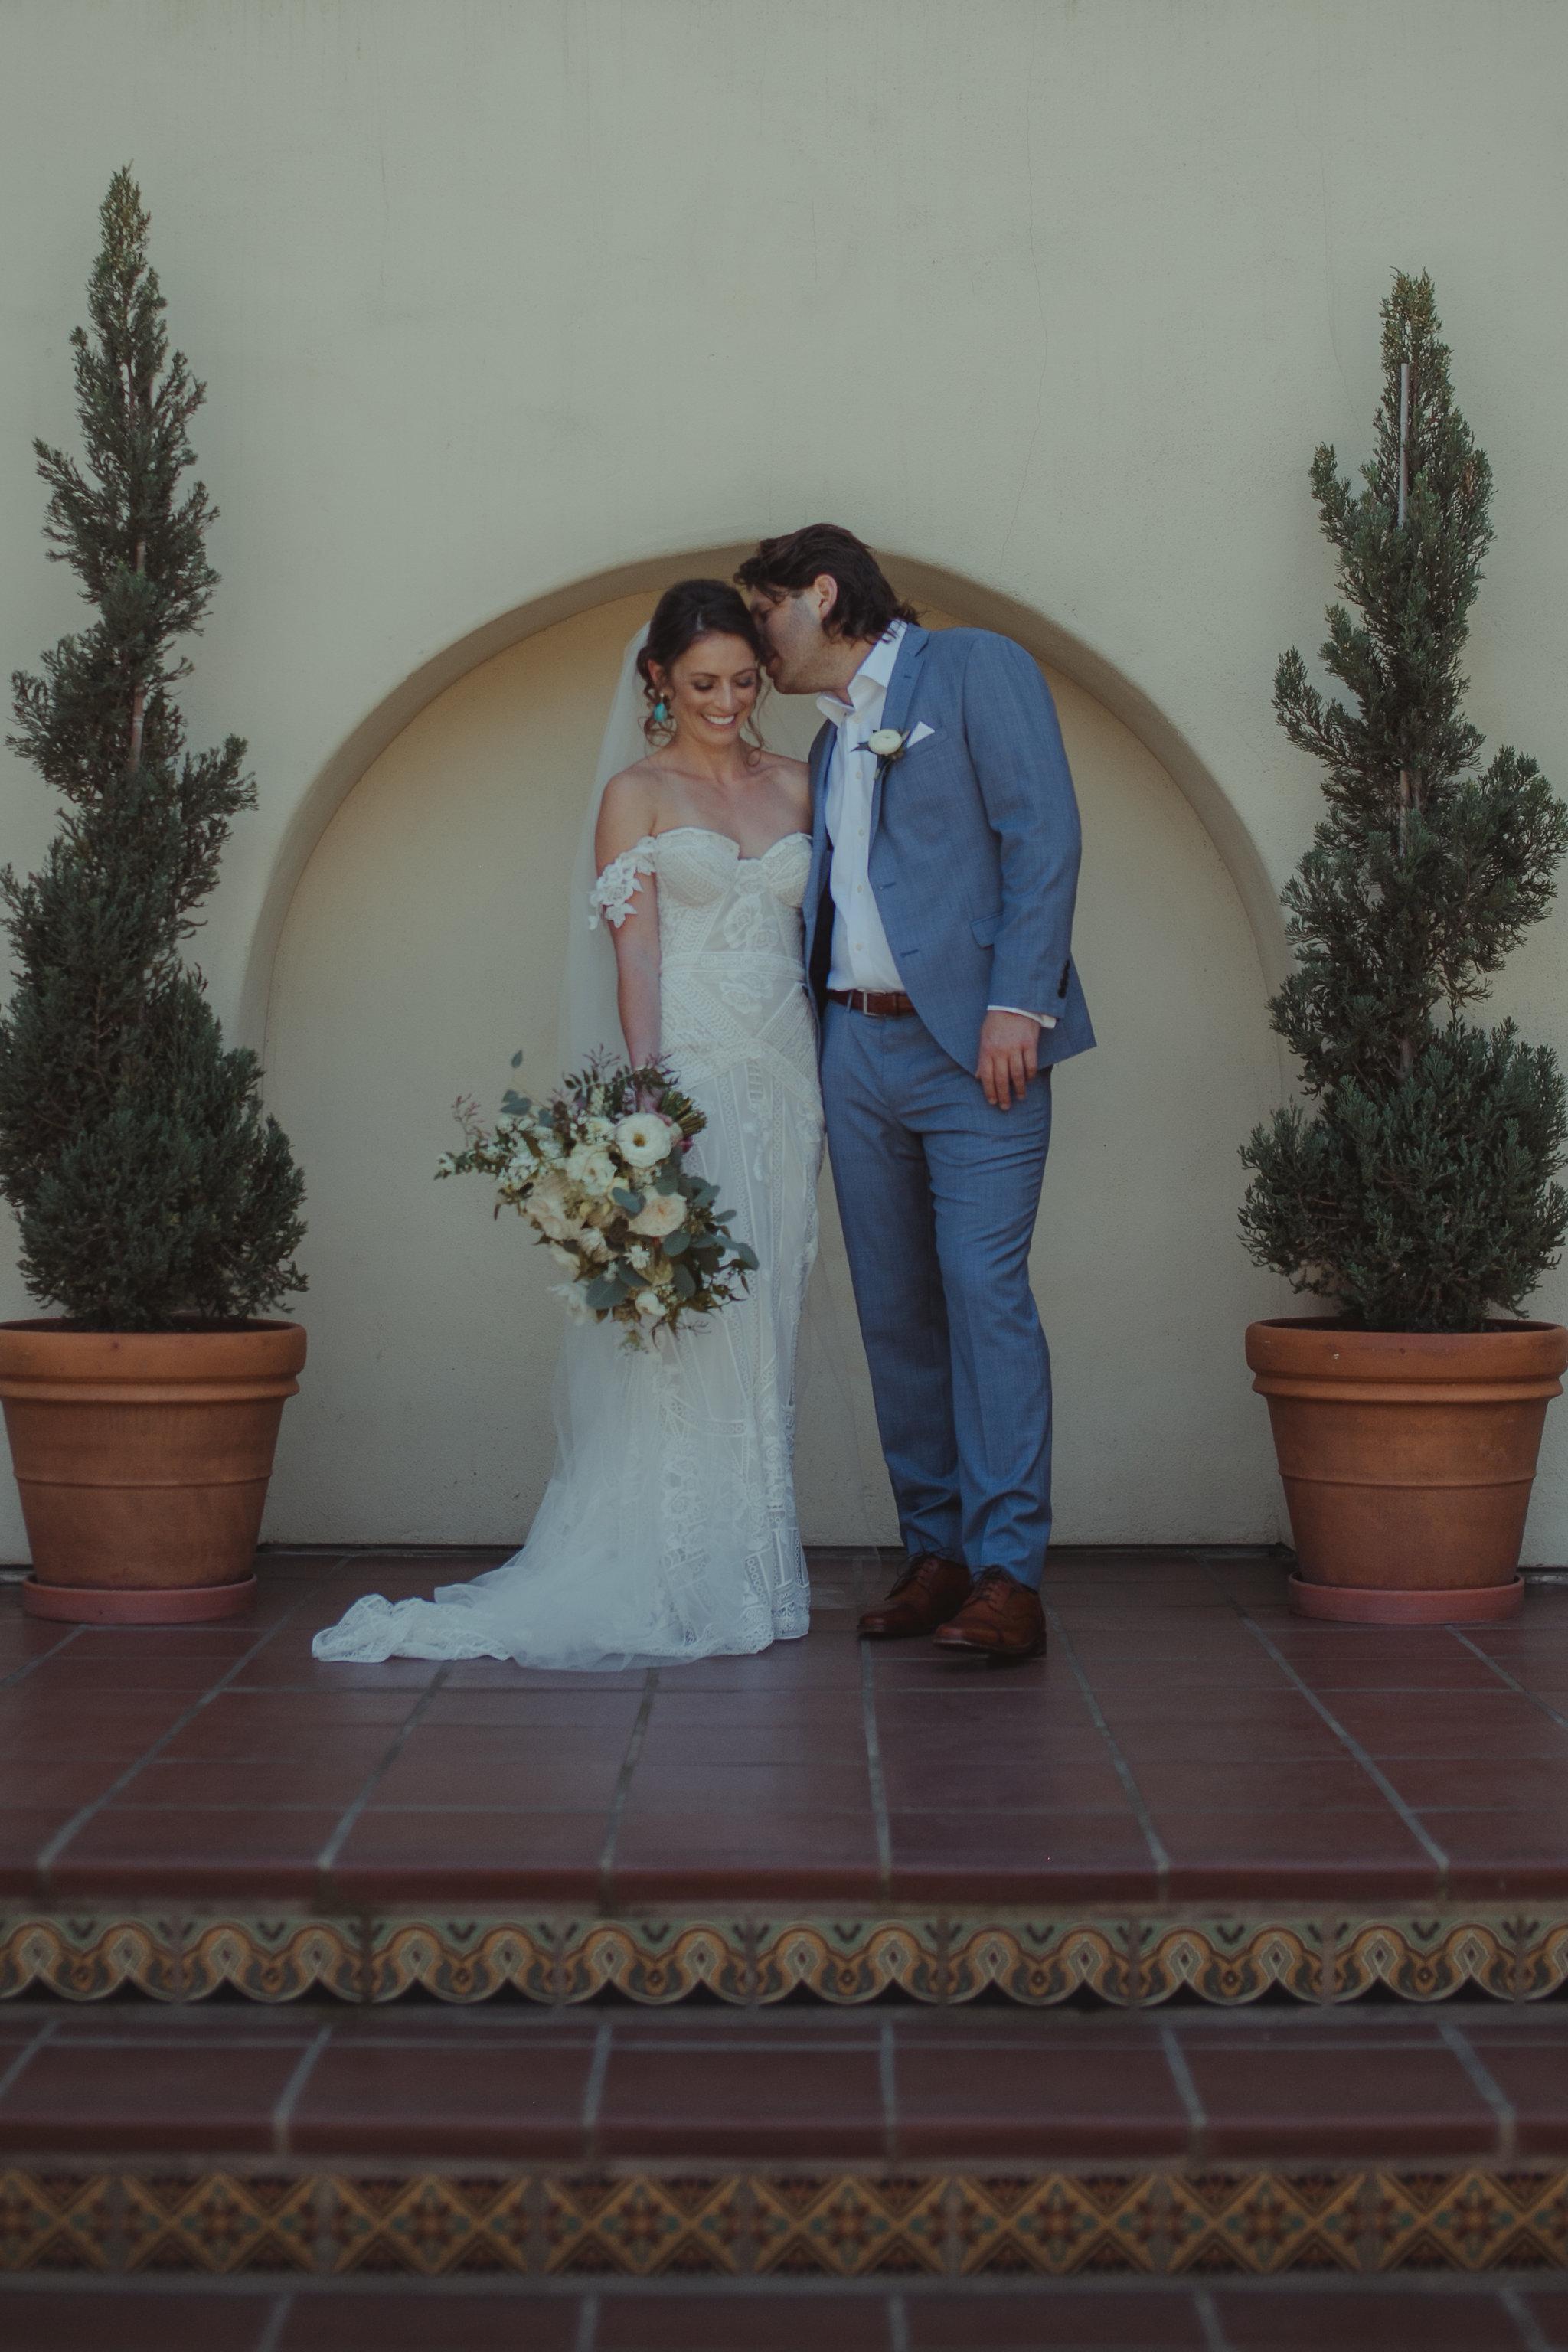 lolo-and-noa-la-jolla-wedding-scripps-blooms-by-breesa-lee-Edit.jpg